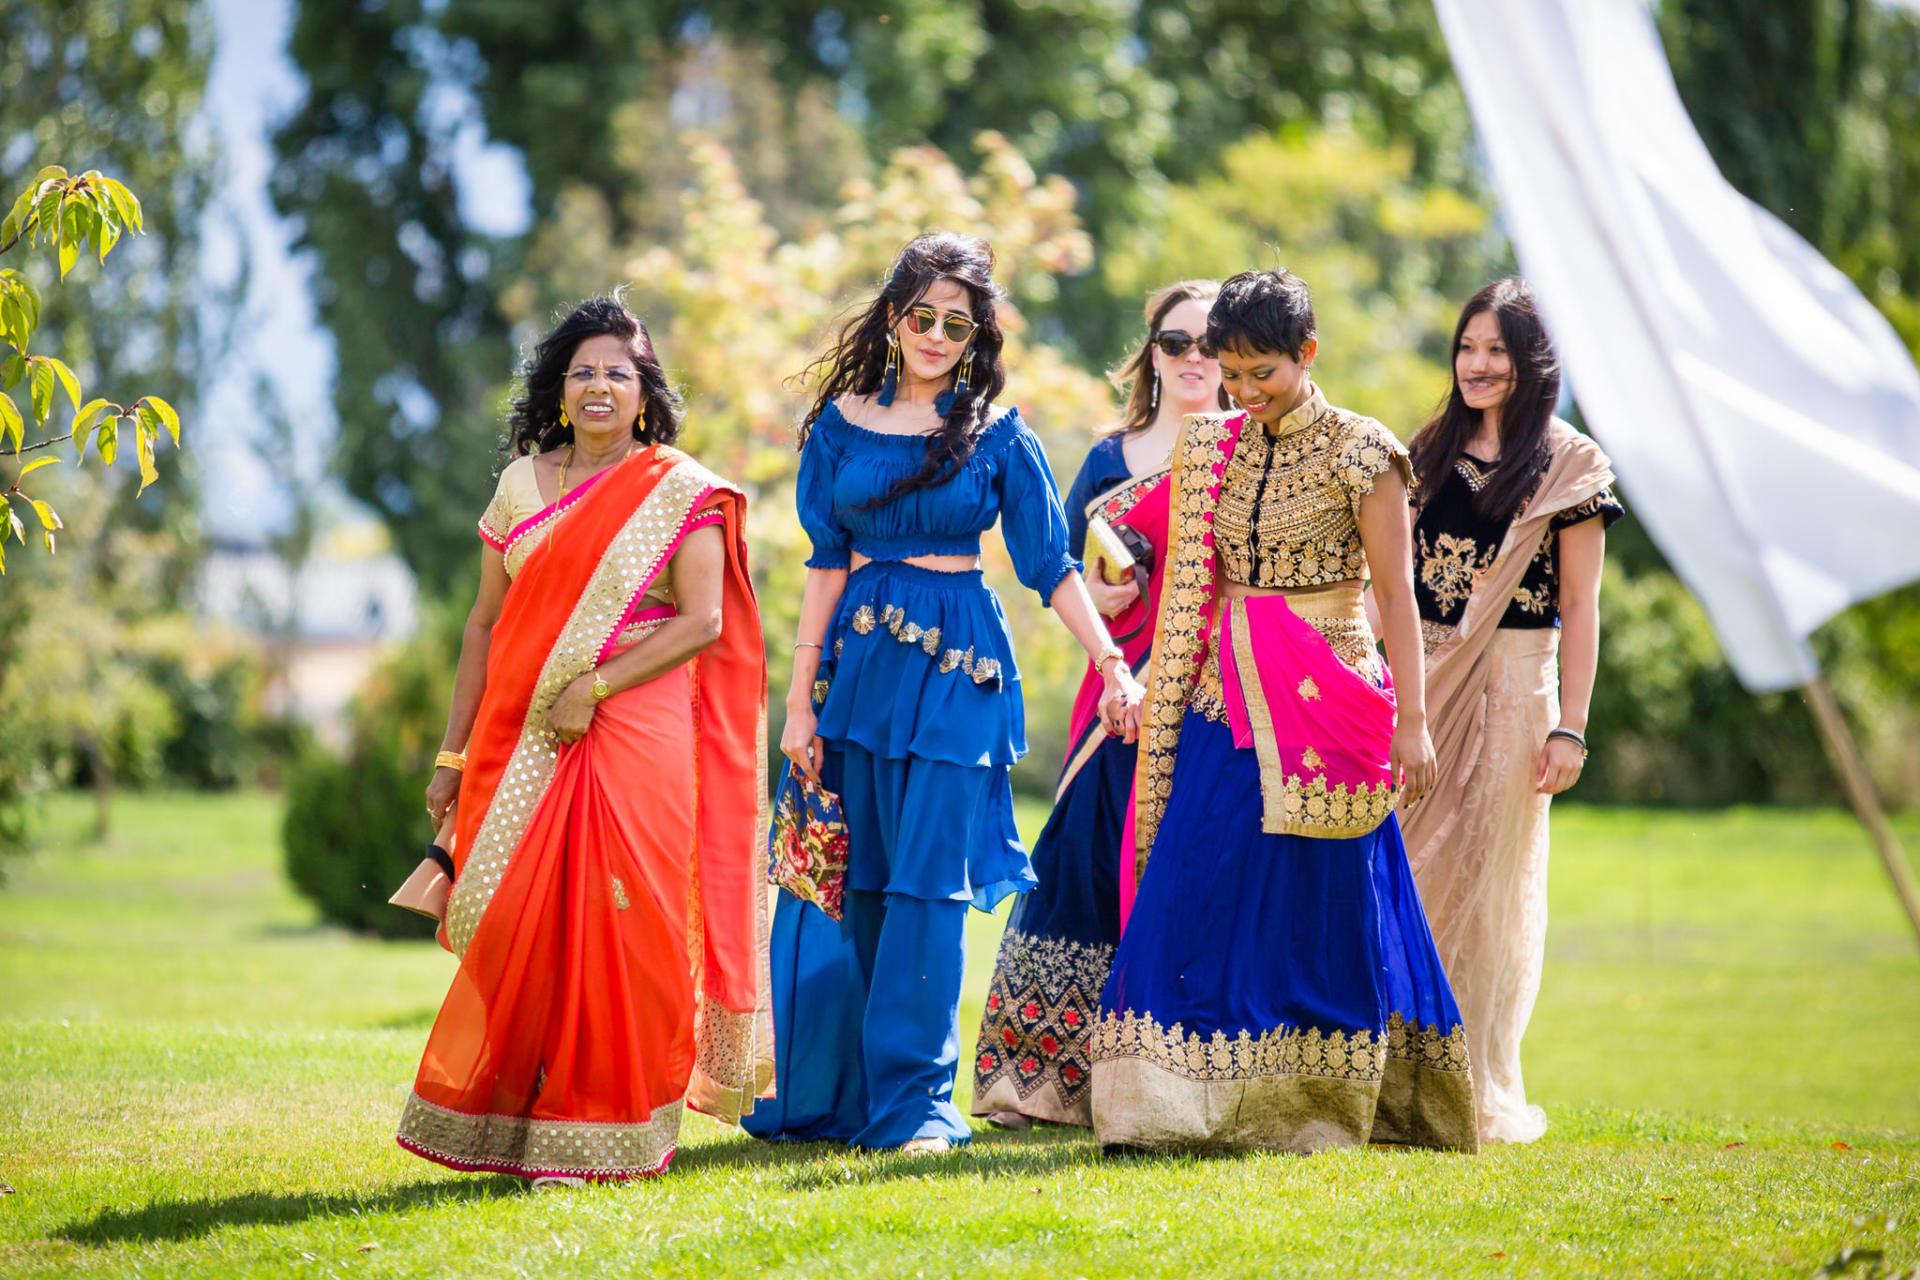 Wanaka wedding planing and styling